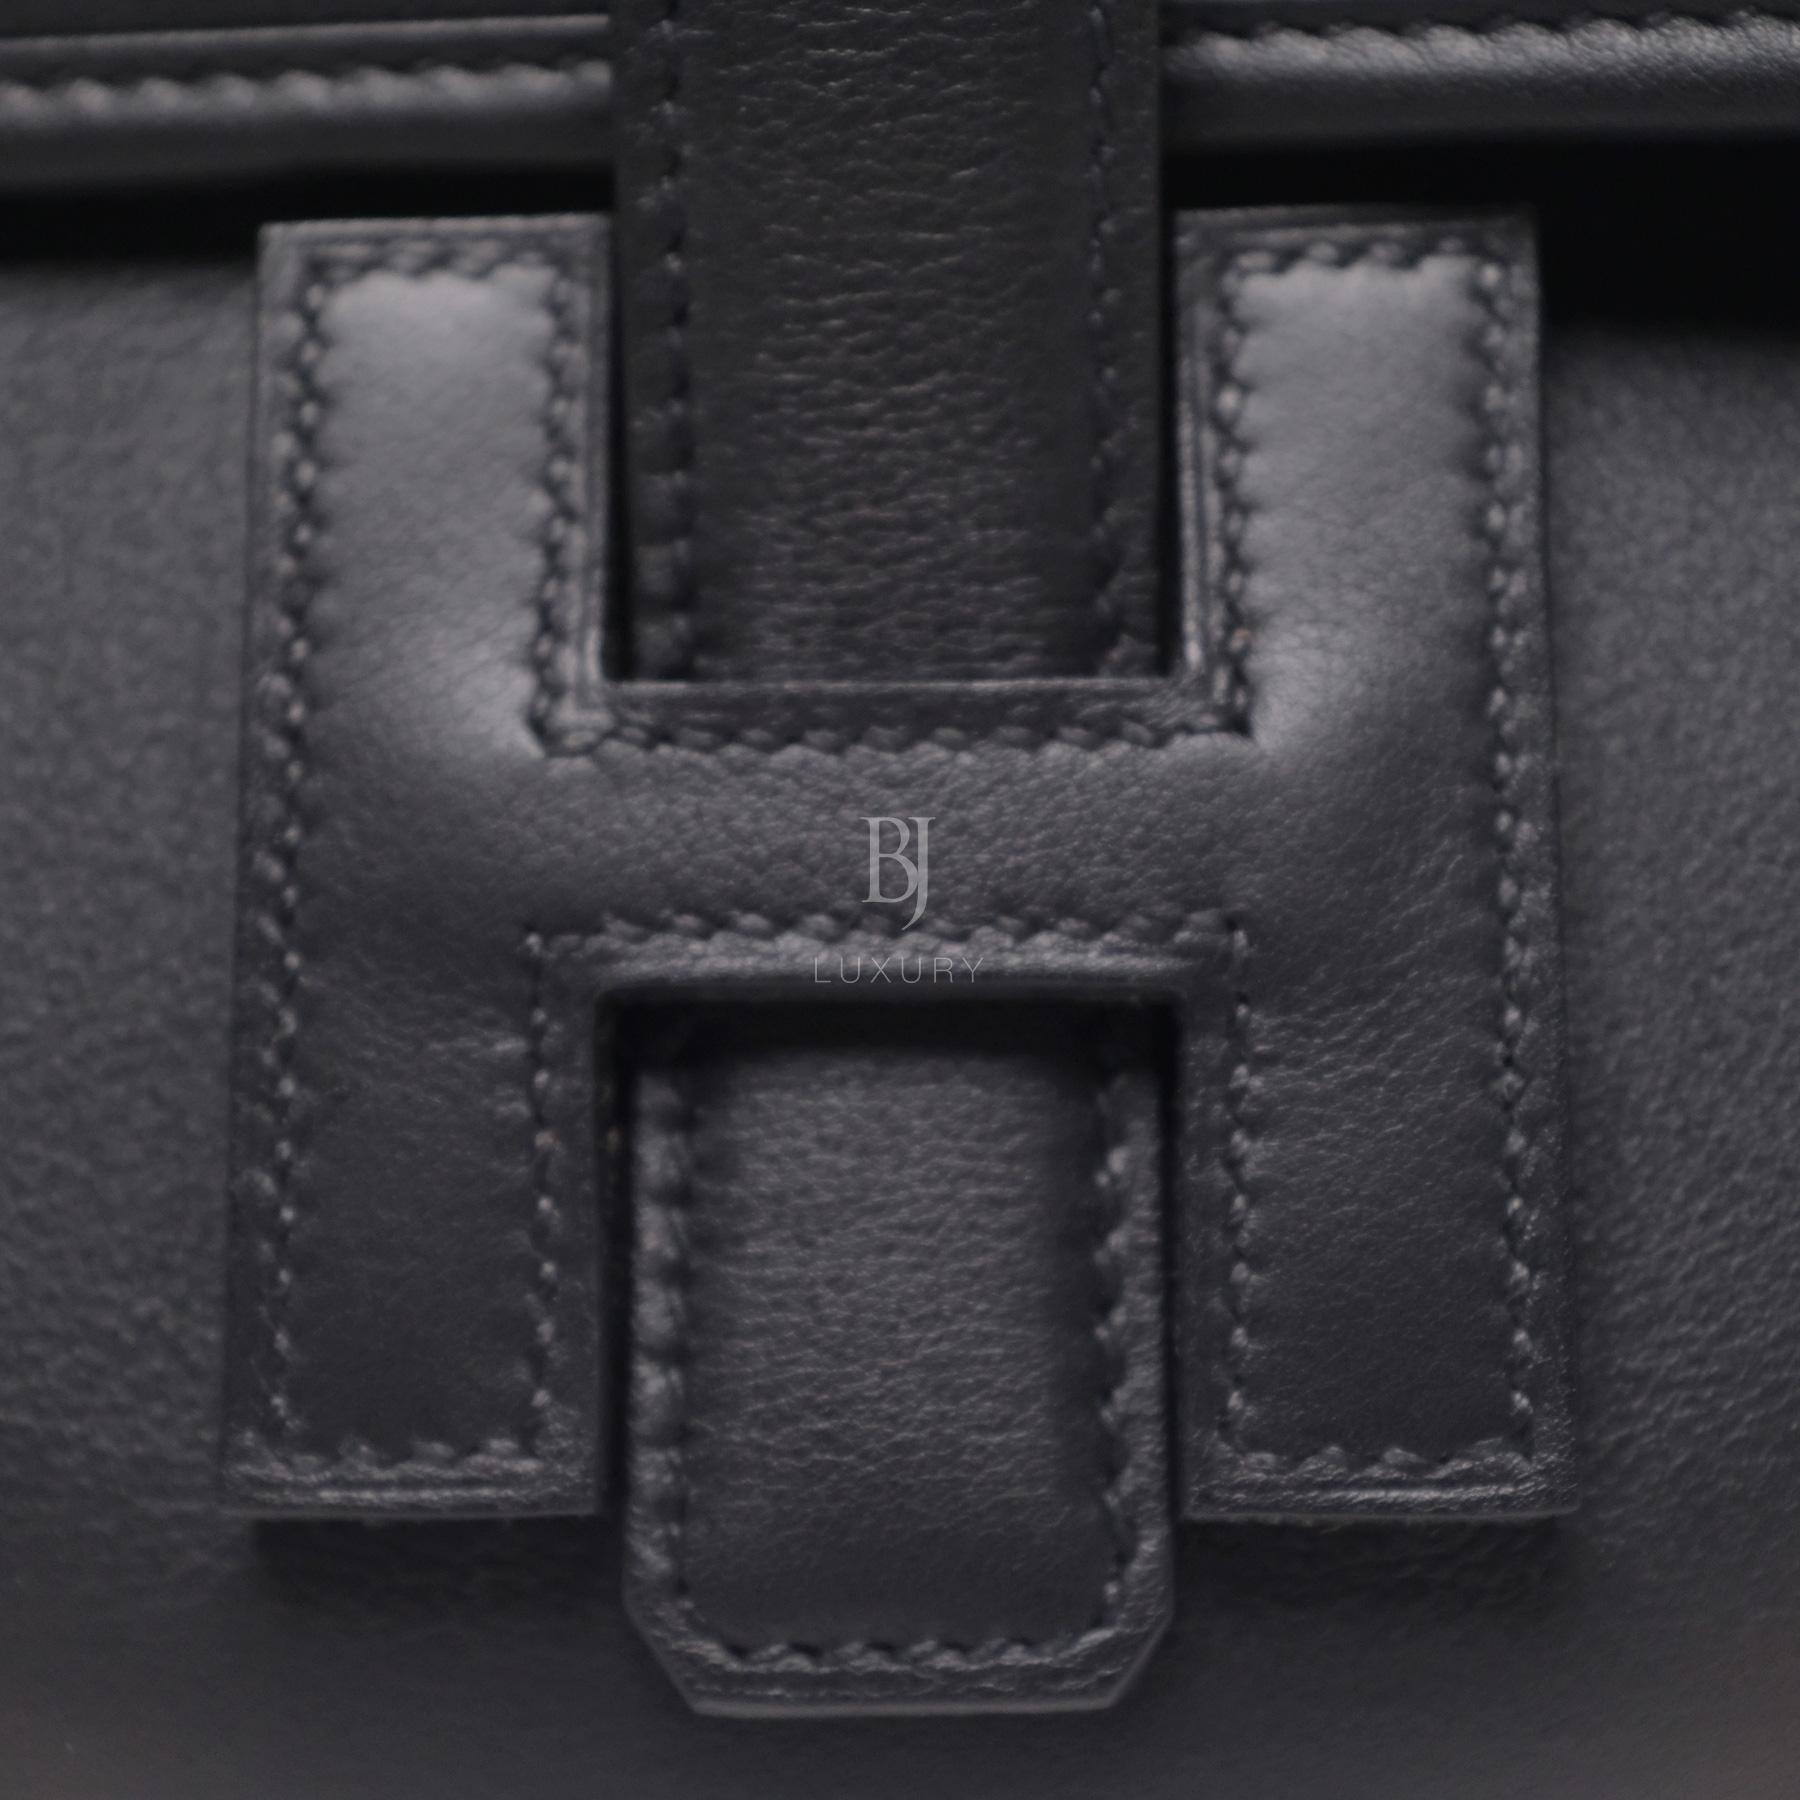 Hermes Jige 29 Black Swift BJ Luxury 7.jpg